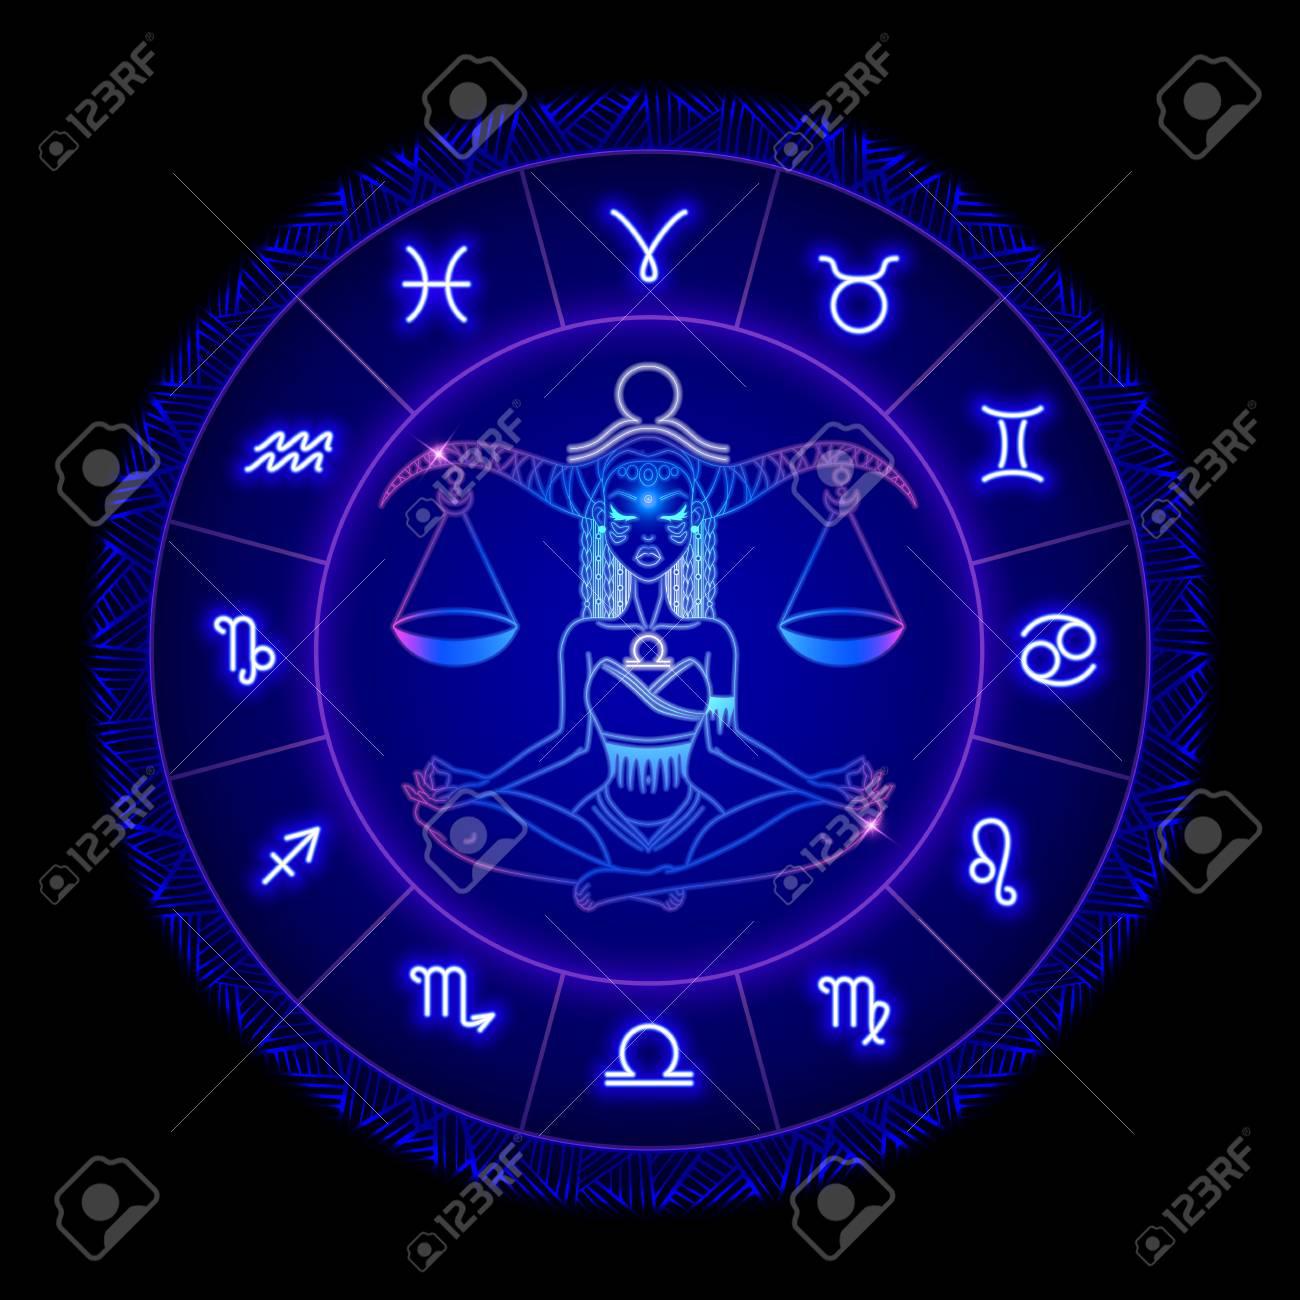 Libra zodiac sign, horoscope symbol. Vector illustration - 103600771